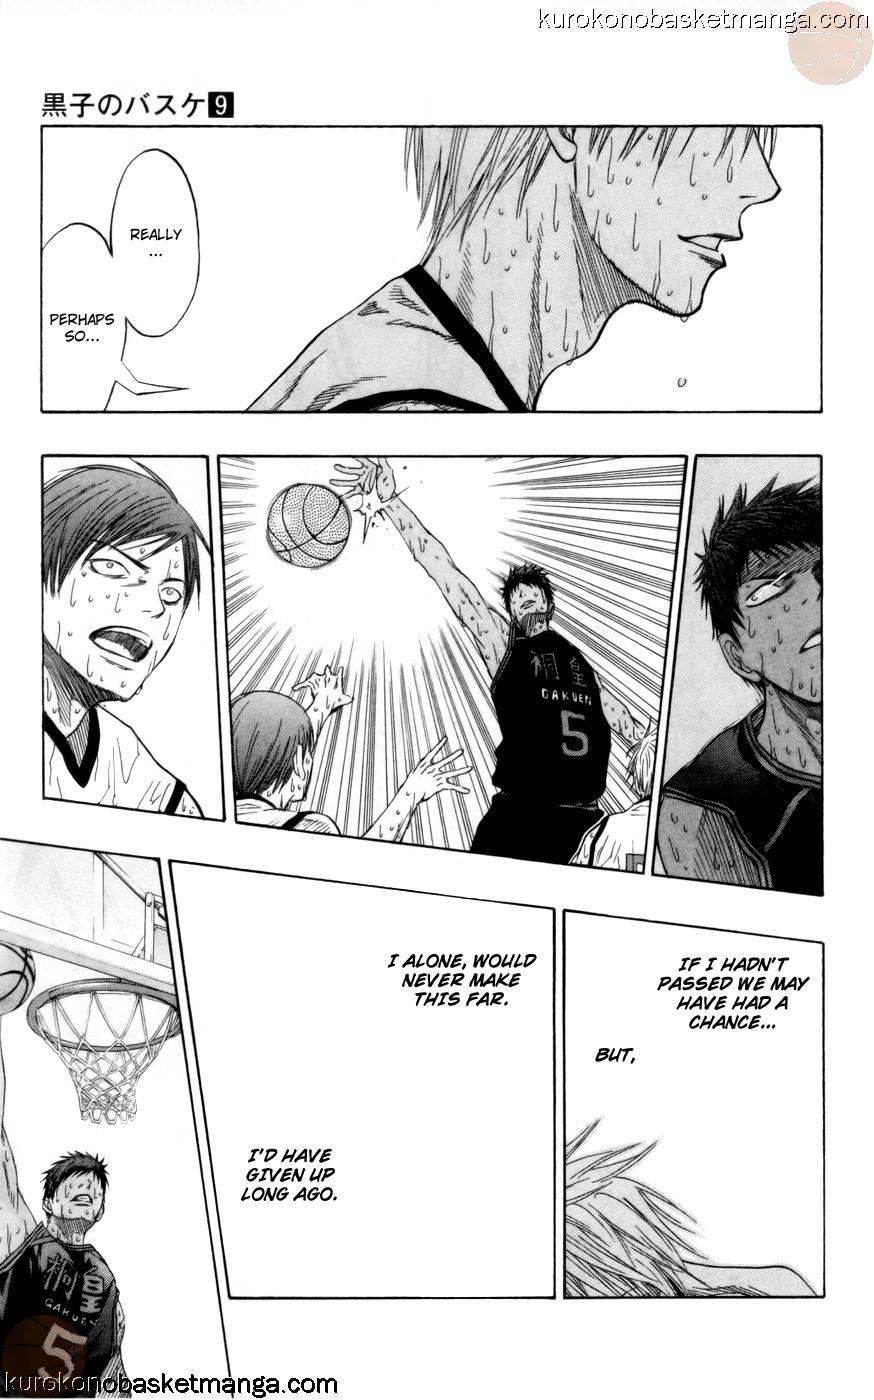 Kuroko no Basket Manga Chapter 72 - Image 17